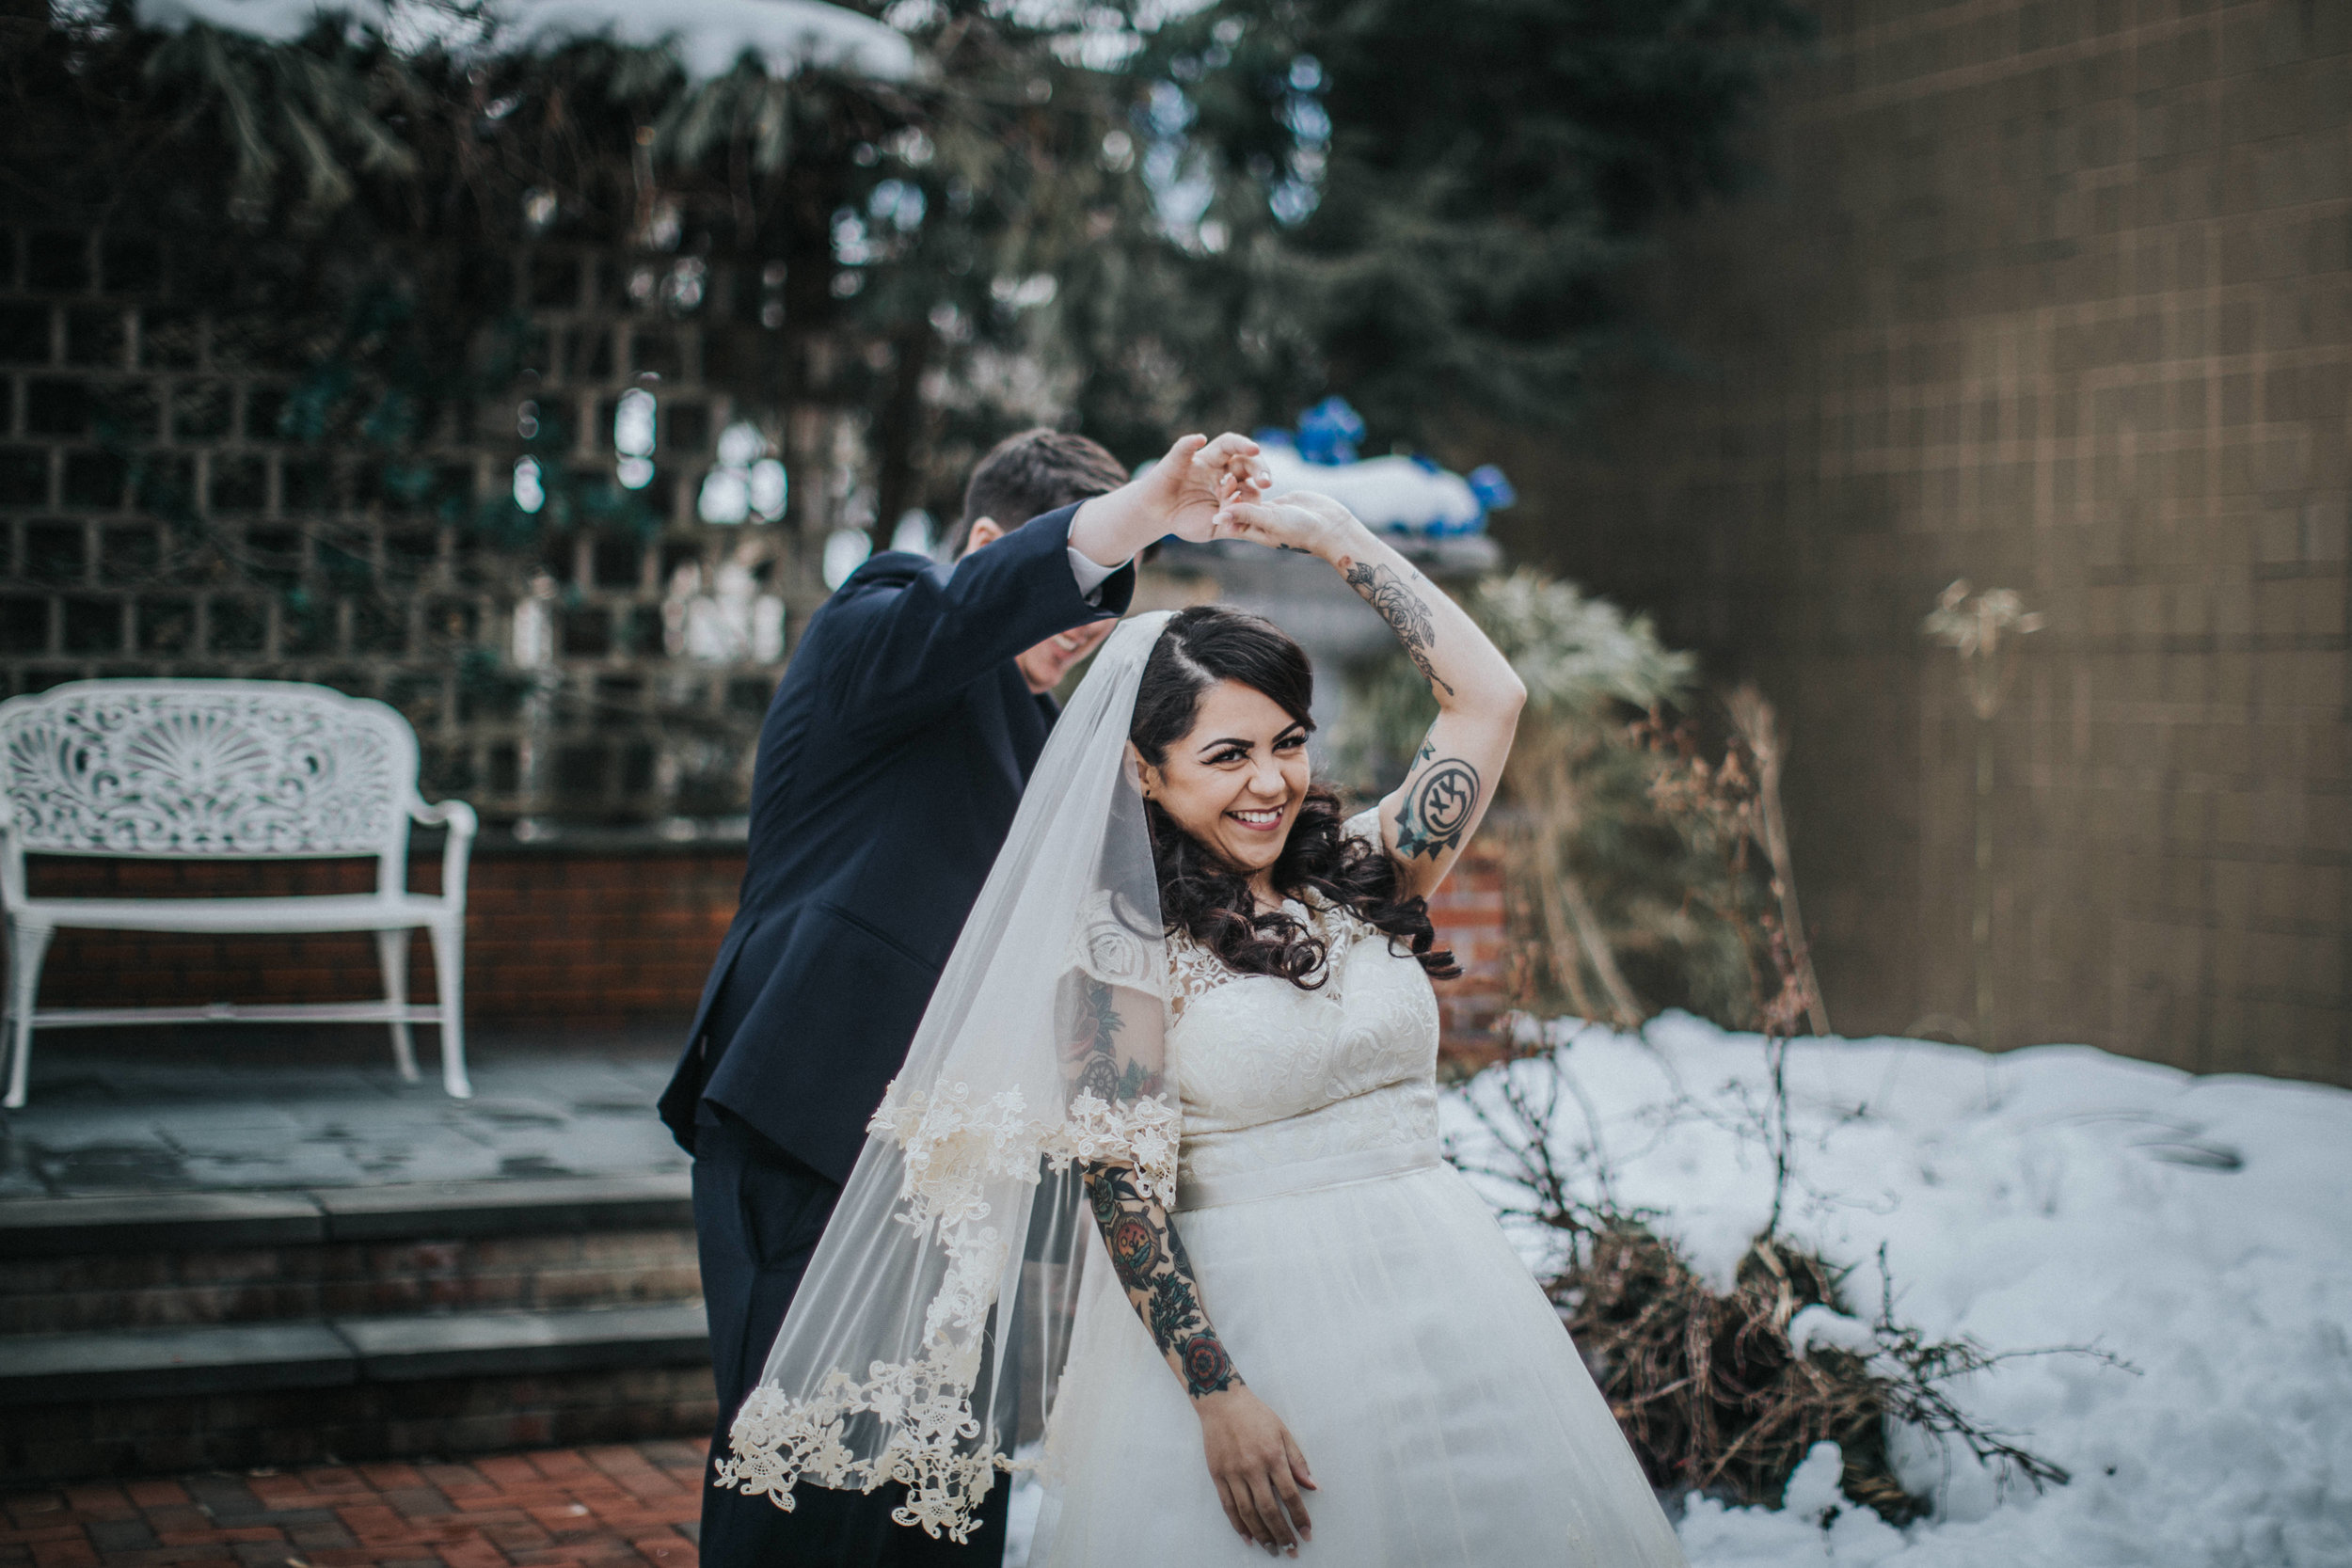 New-Jersey-Wedding-Photographer-ReceptionCenter-Valeria&Mike-First-Look-Bride&Groom (10 of 69).jpg